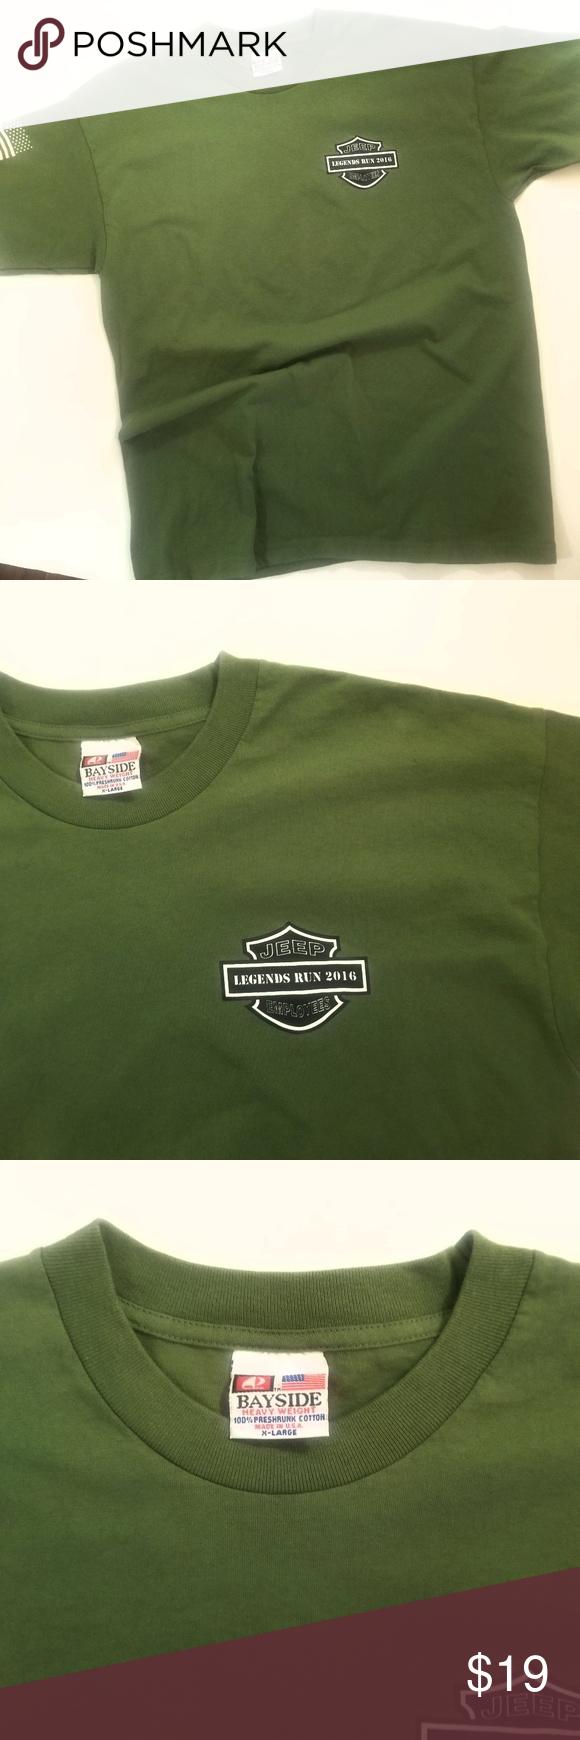 Jeep Tee Shirt Tee Shirts Clothes Design Shirts